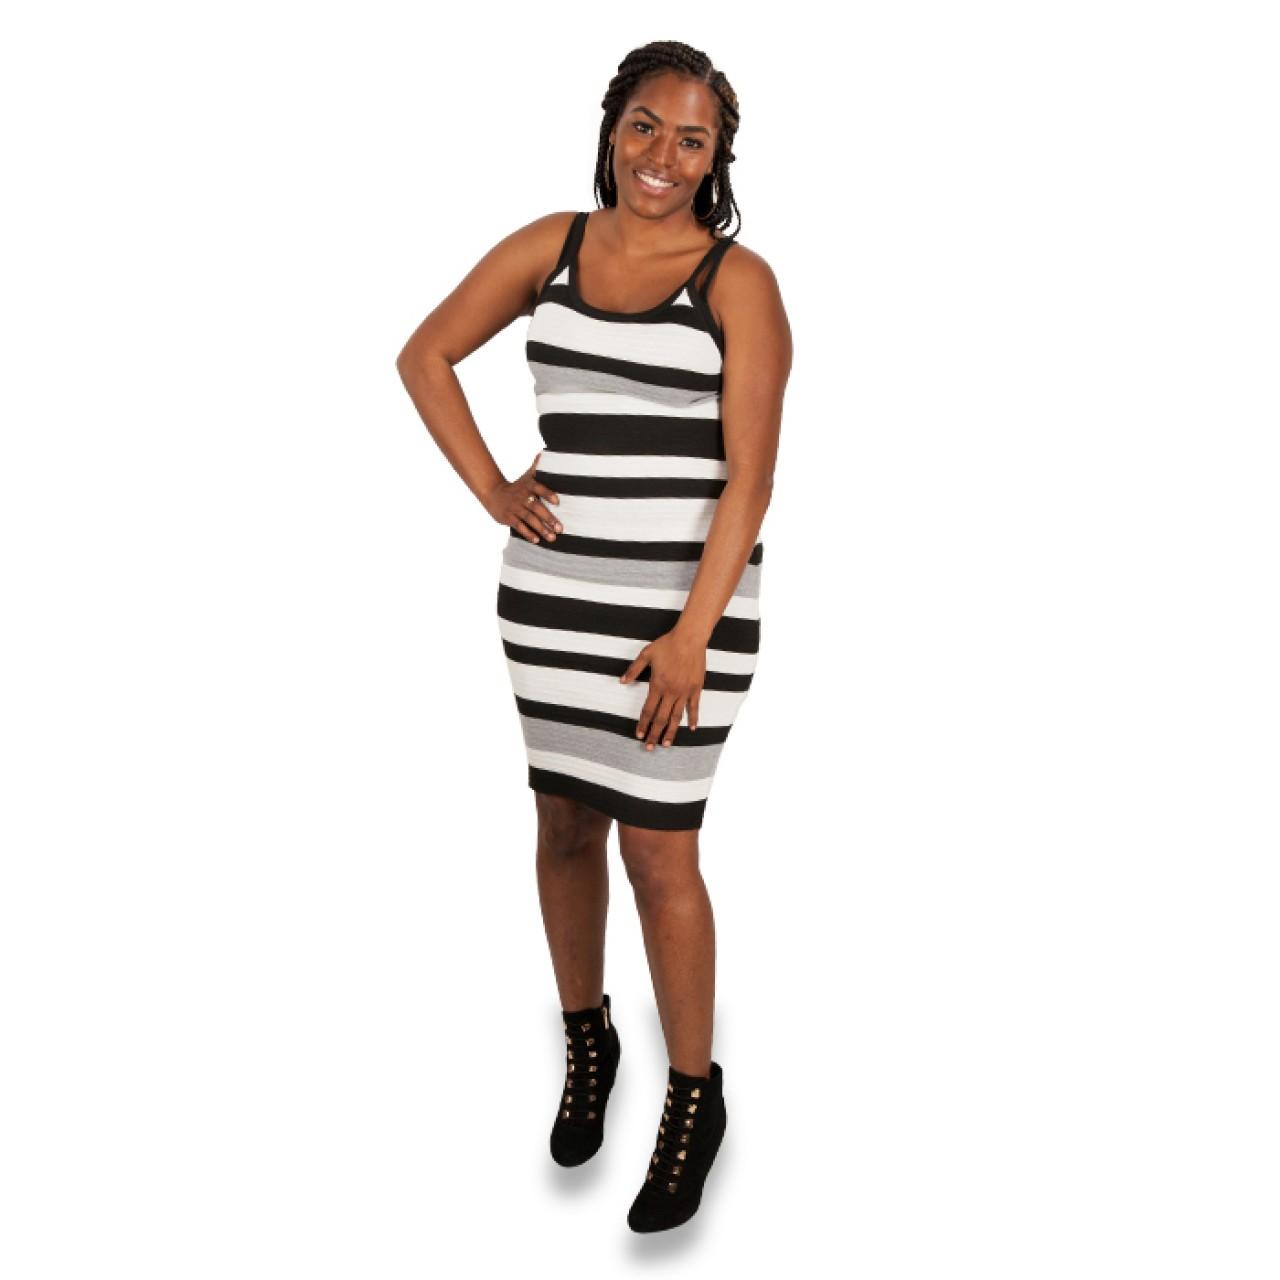 Women's designer Striped Belted Sheath Dress